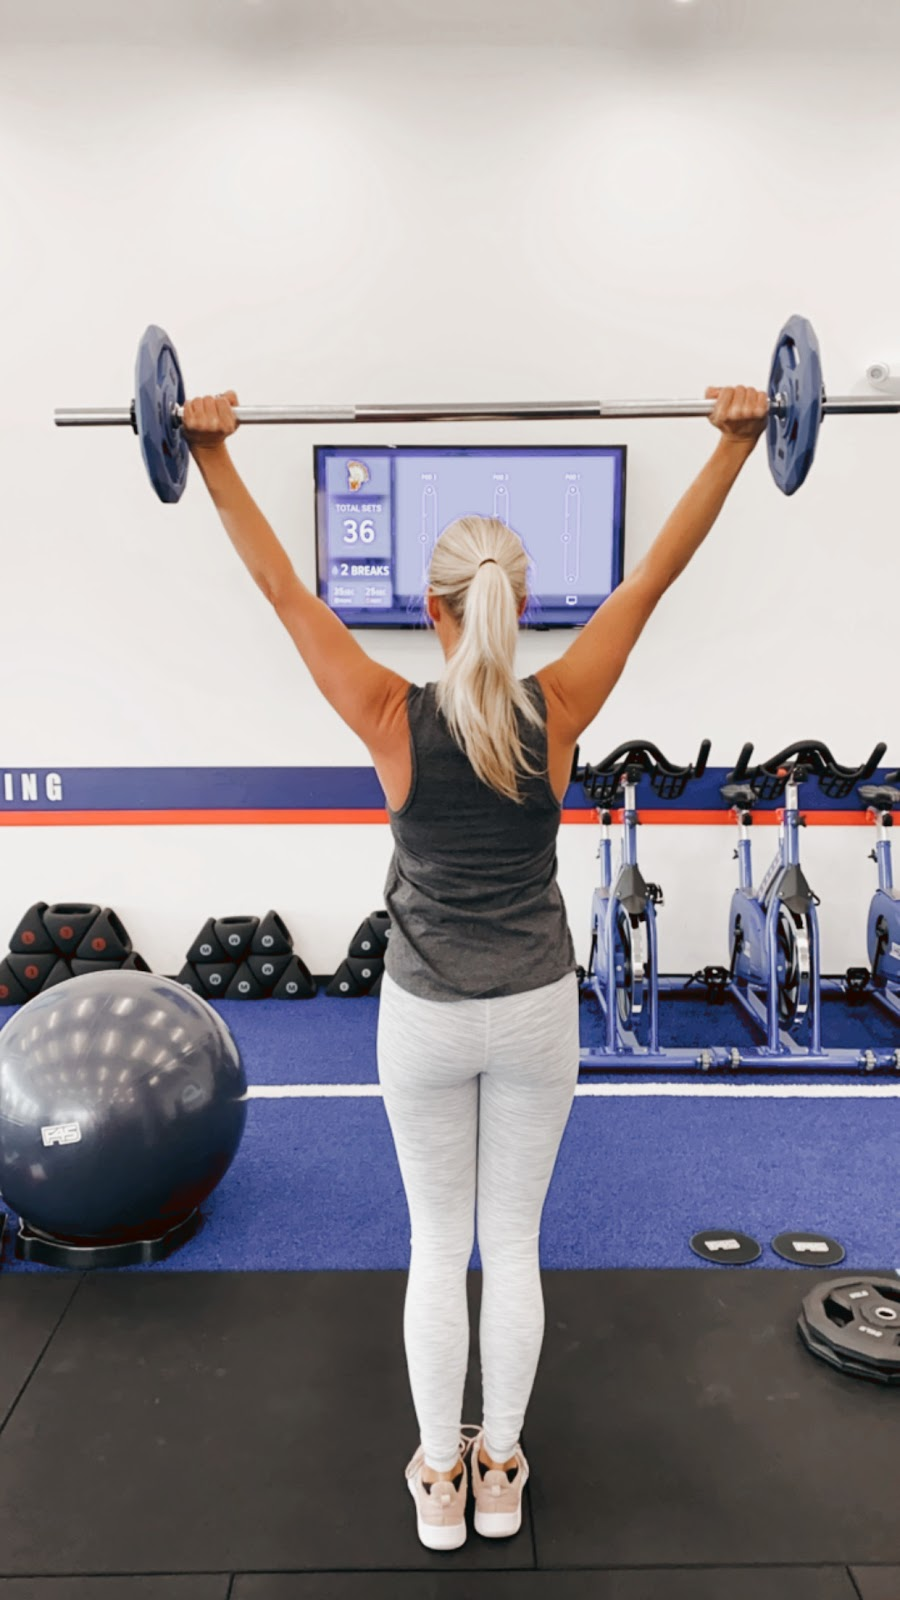 F45 Training Stetson Hills (Colorado Springs) - gym  | Photo 5 of 10 | Address: 5860 Barnes Rd, Colorado Springs, CO 80922, USA | Phone: (719) 465-9116